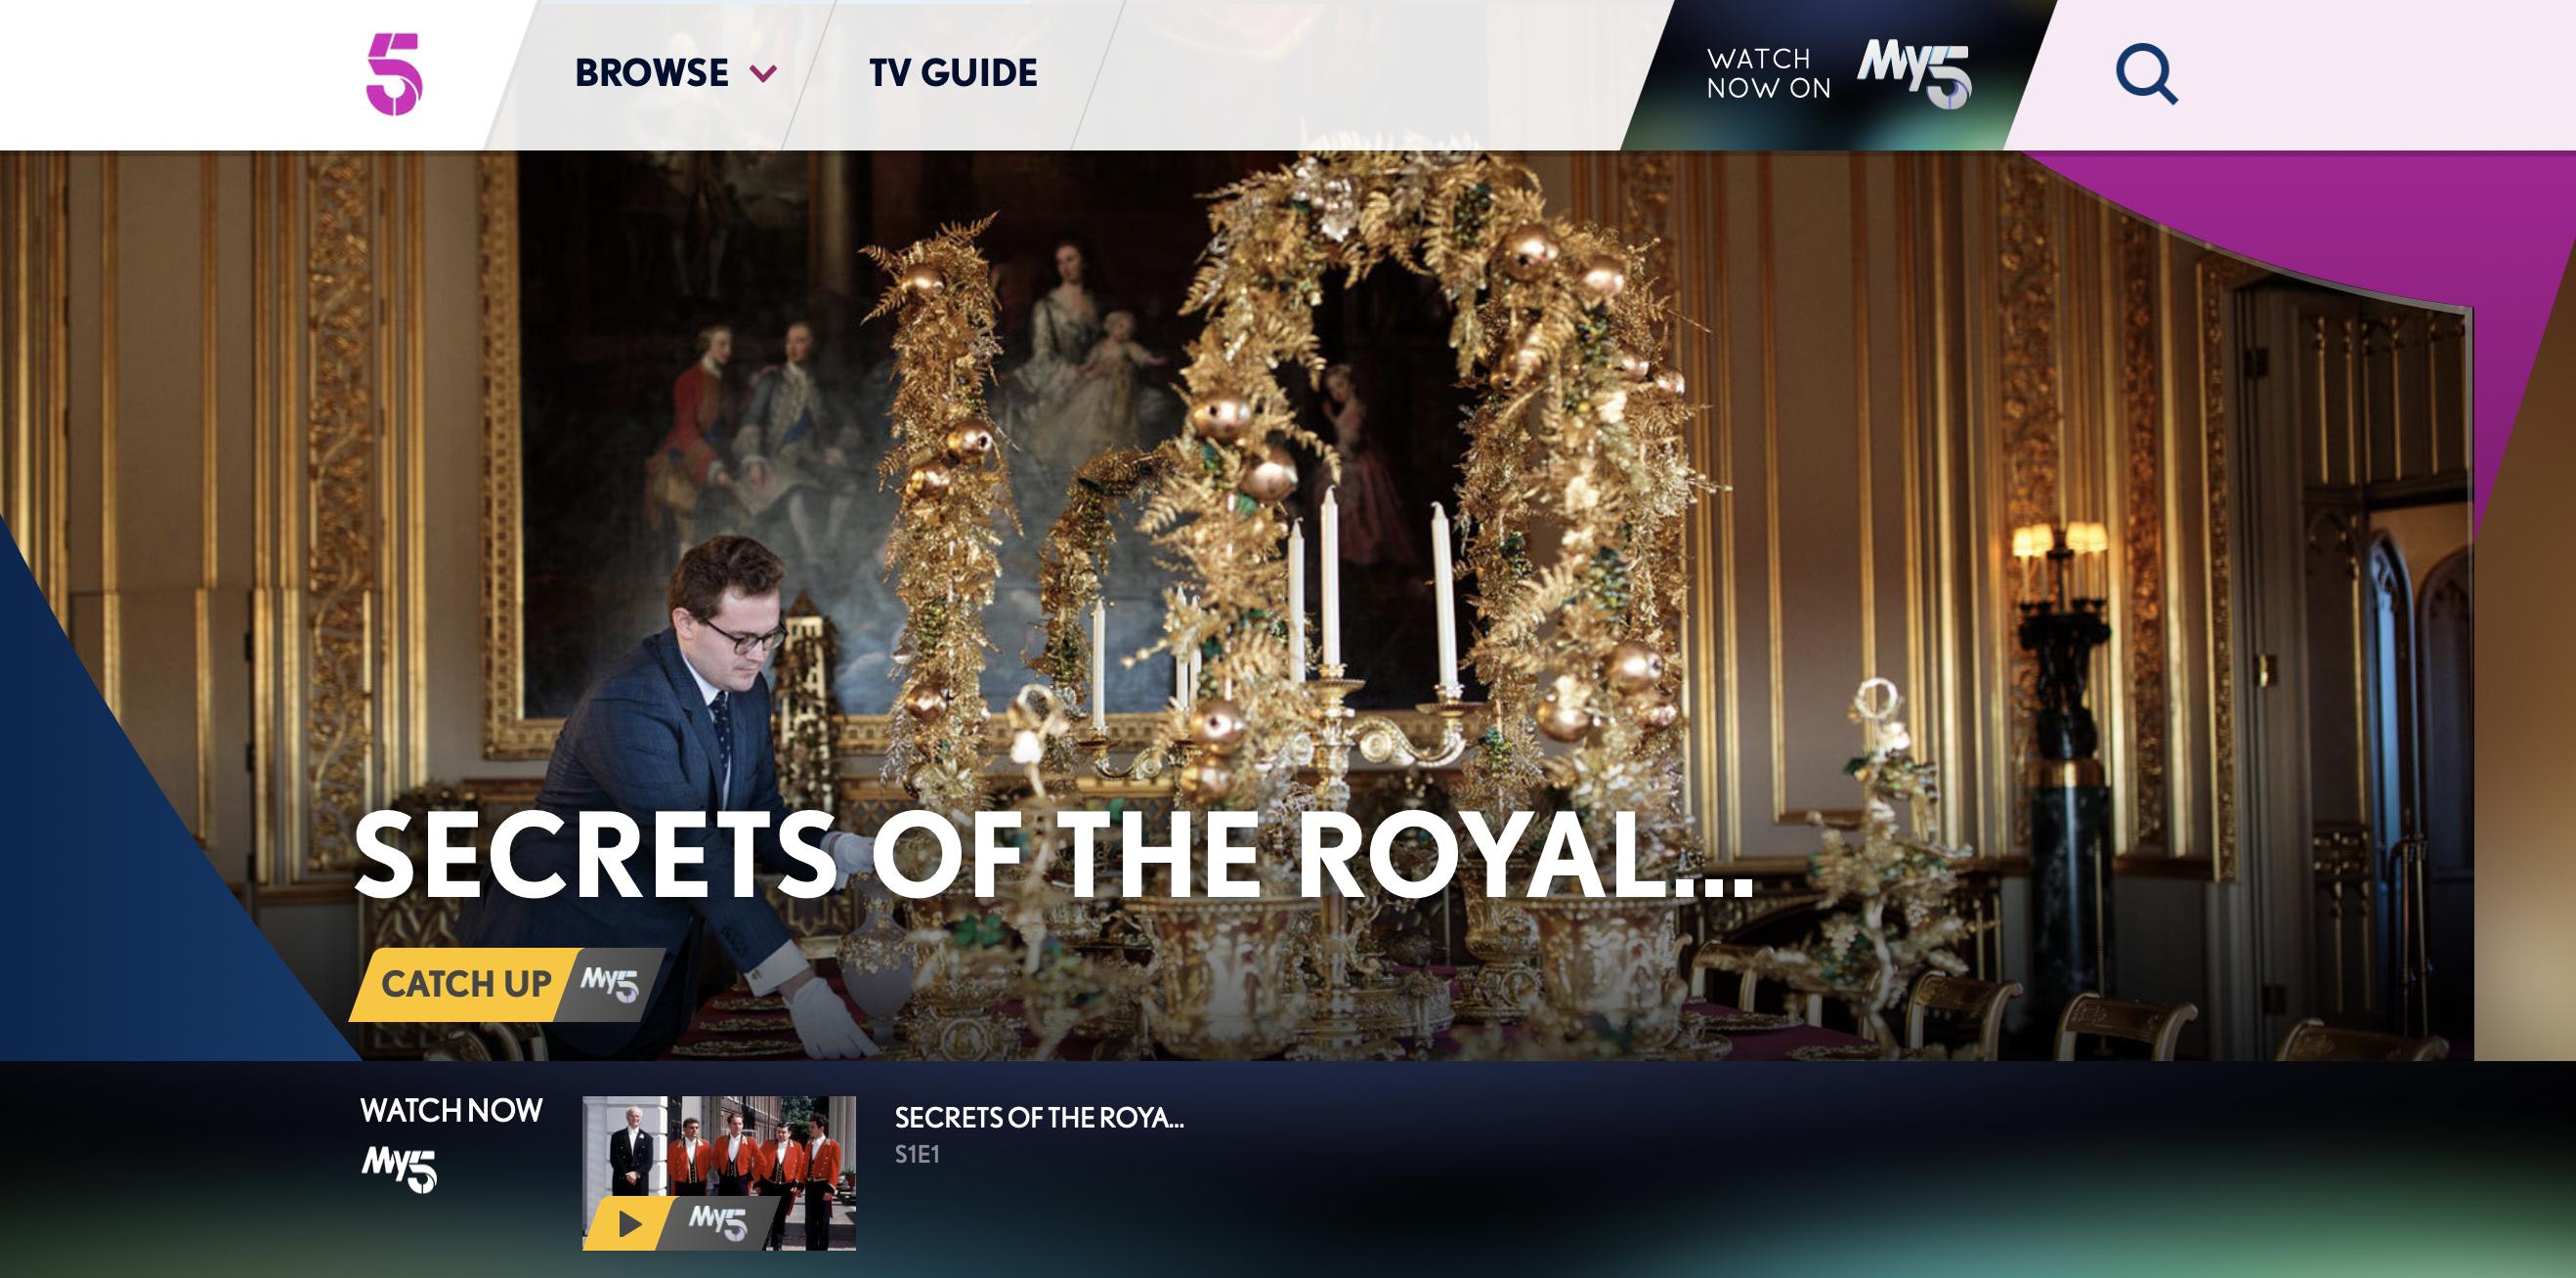 The Royal Servants